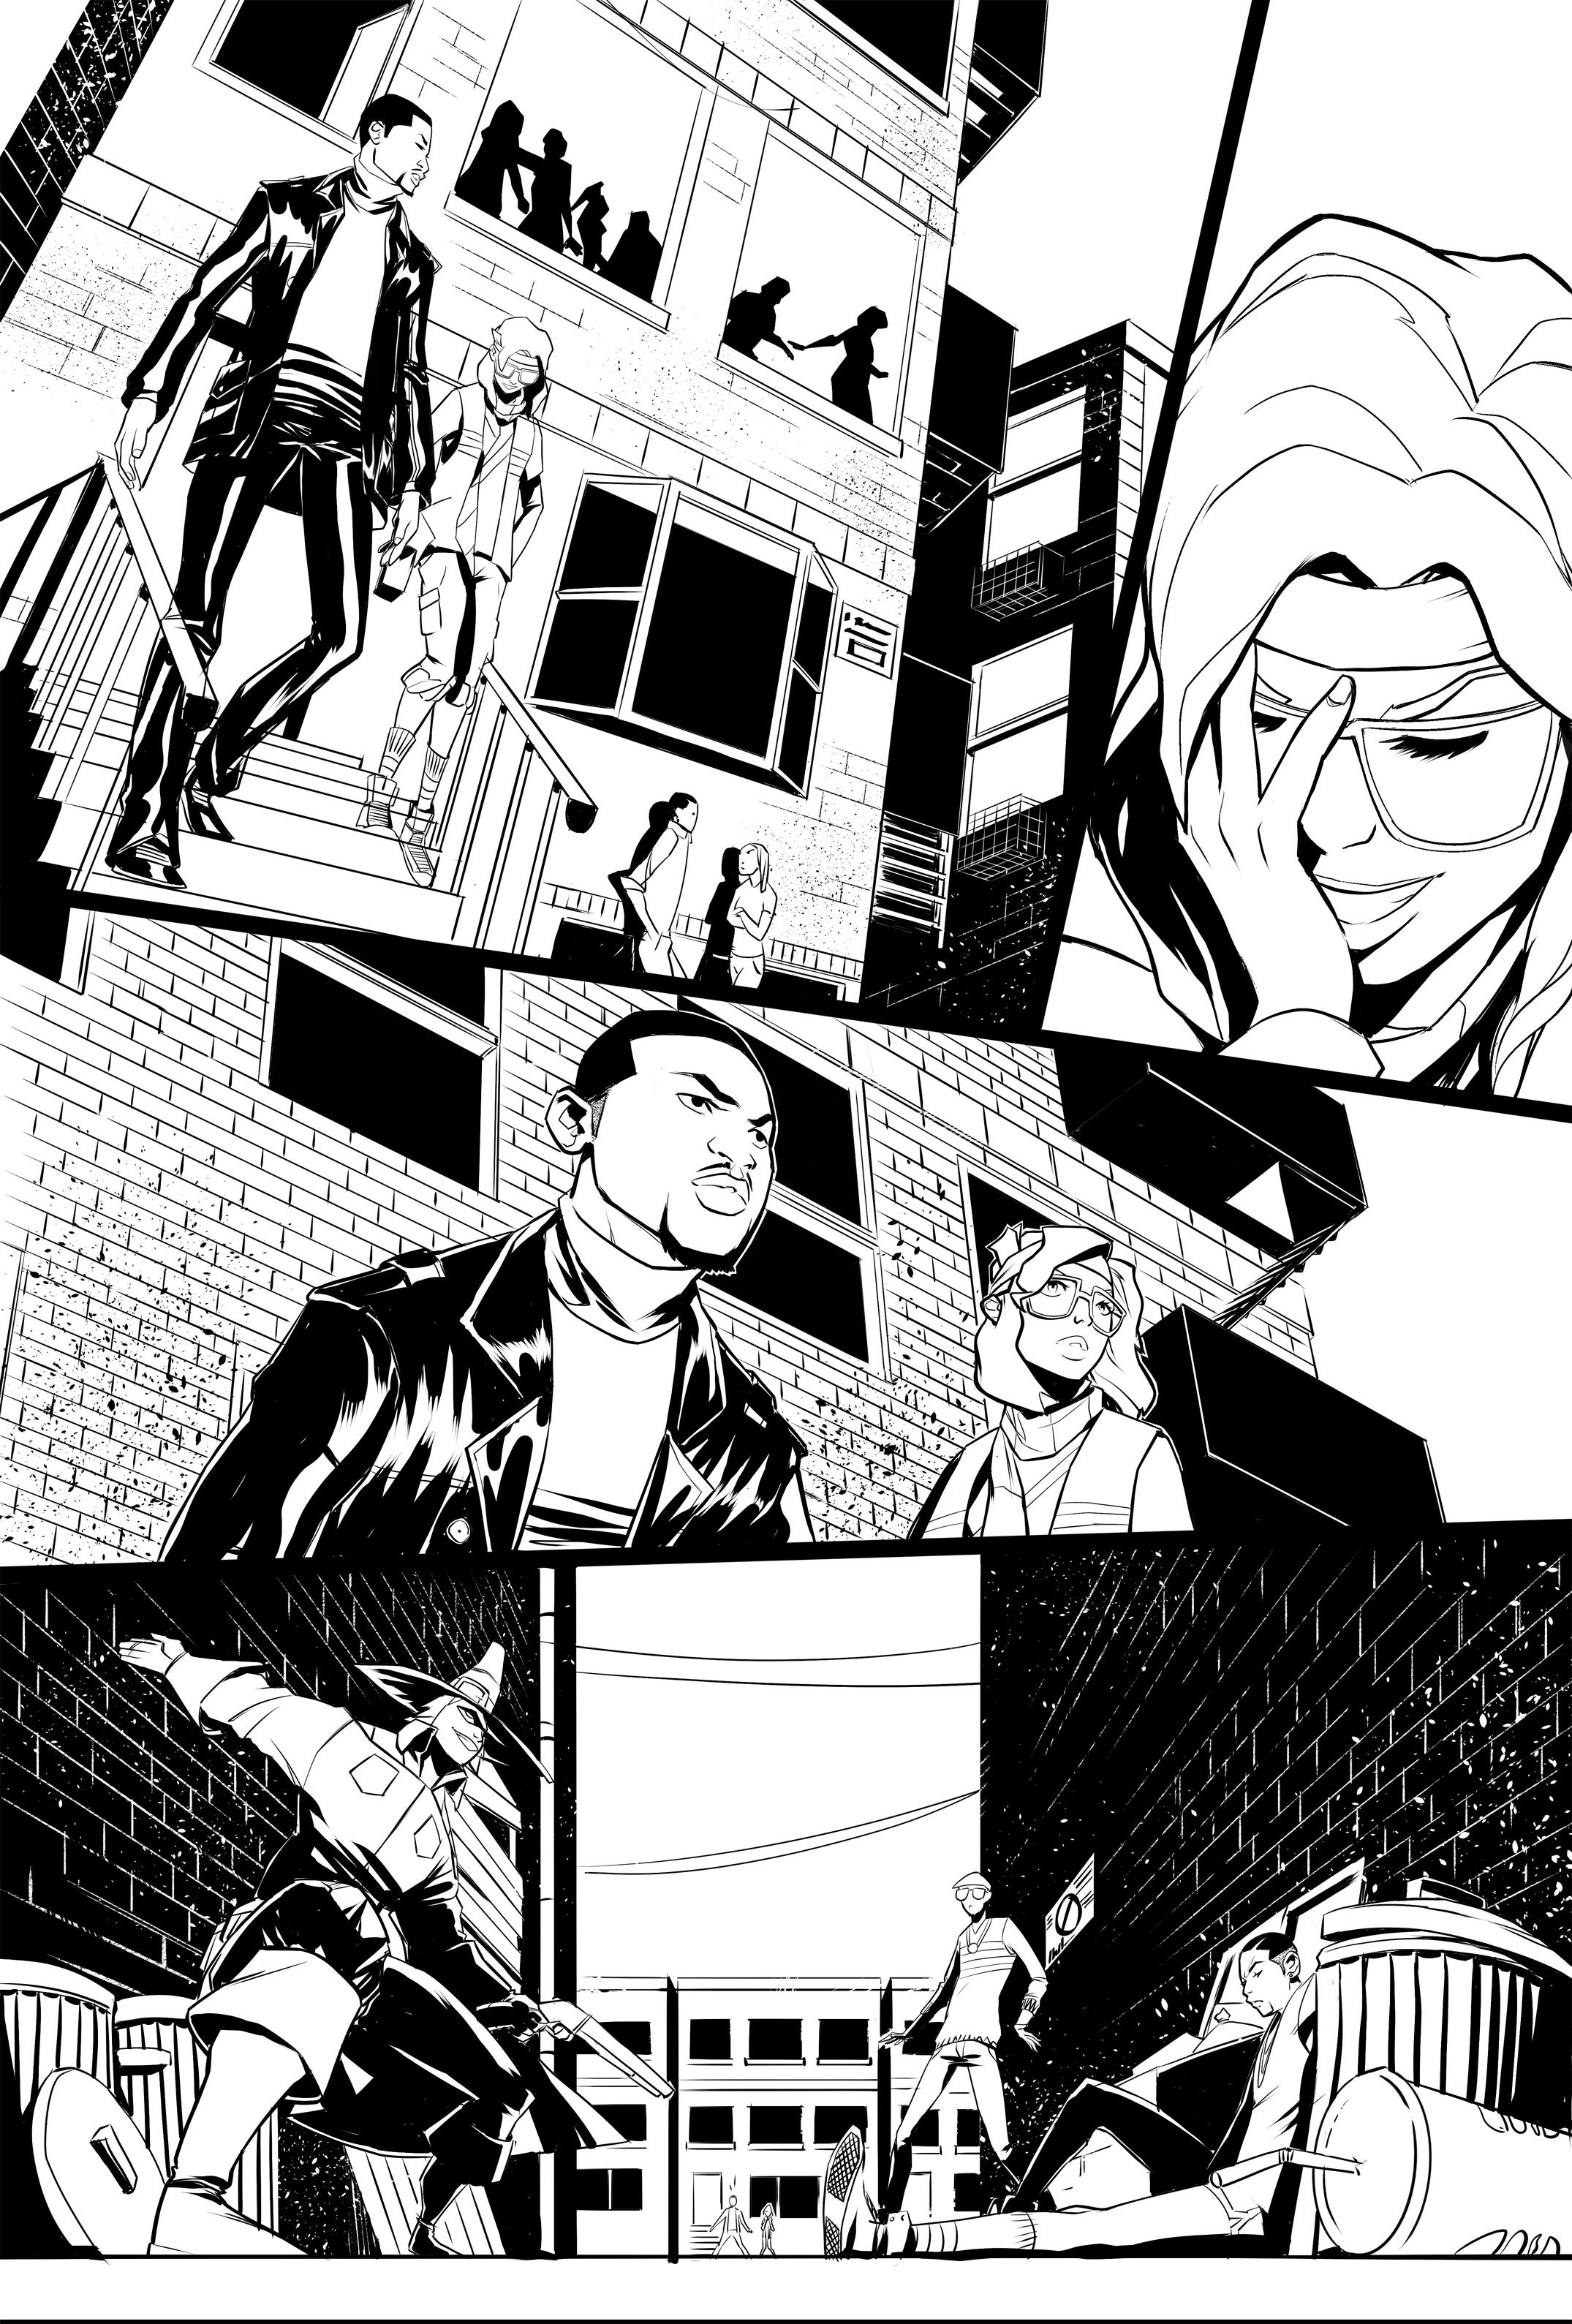 RUN DMC PAGE 1 (LINE ART)